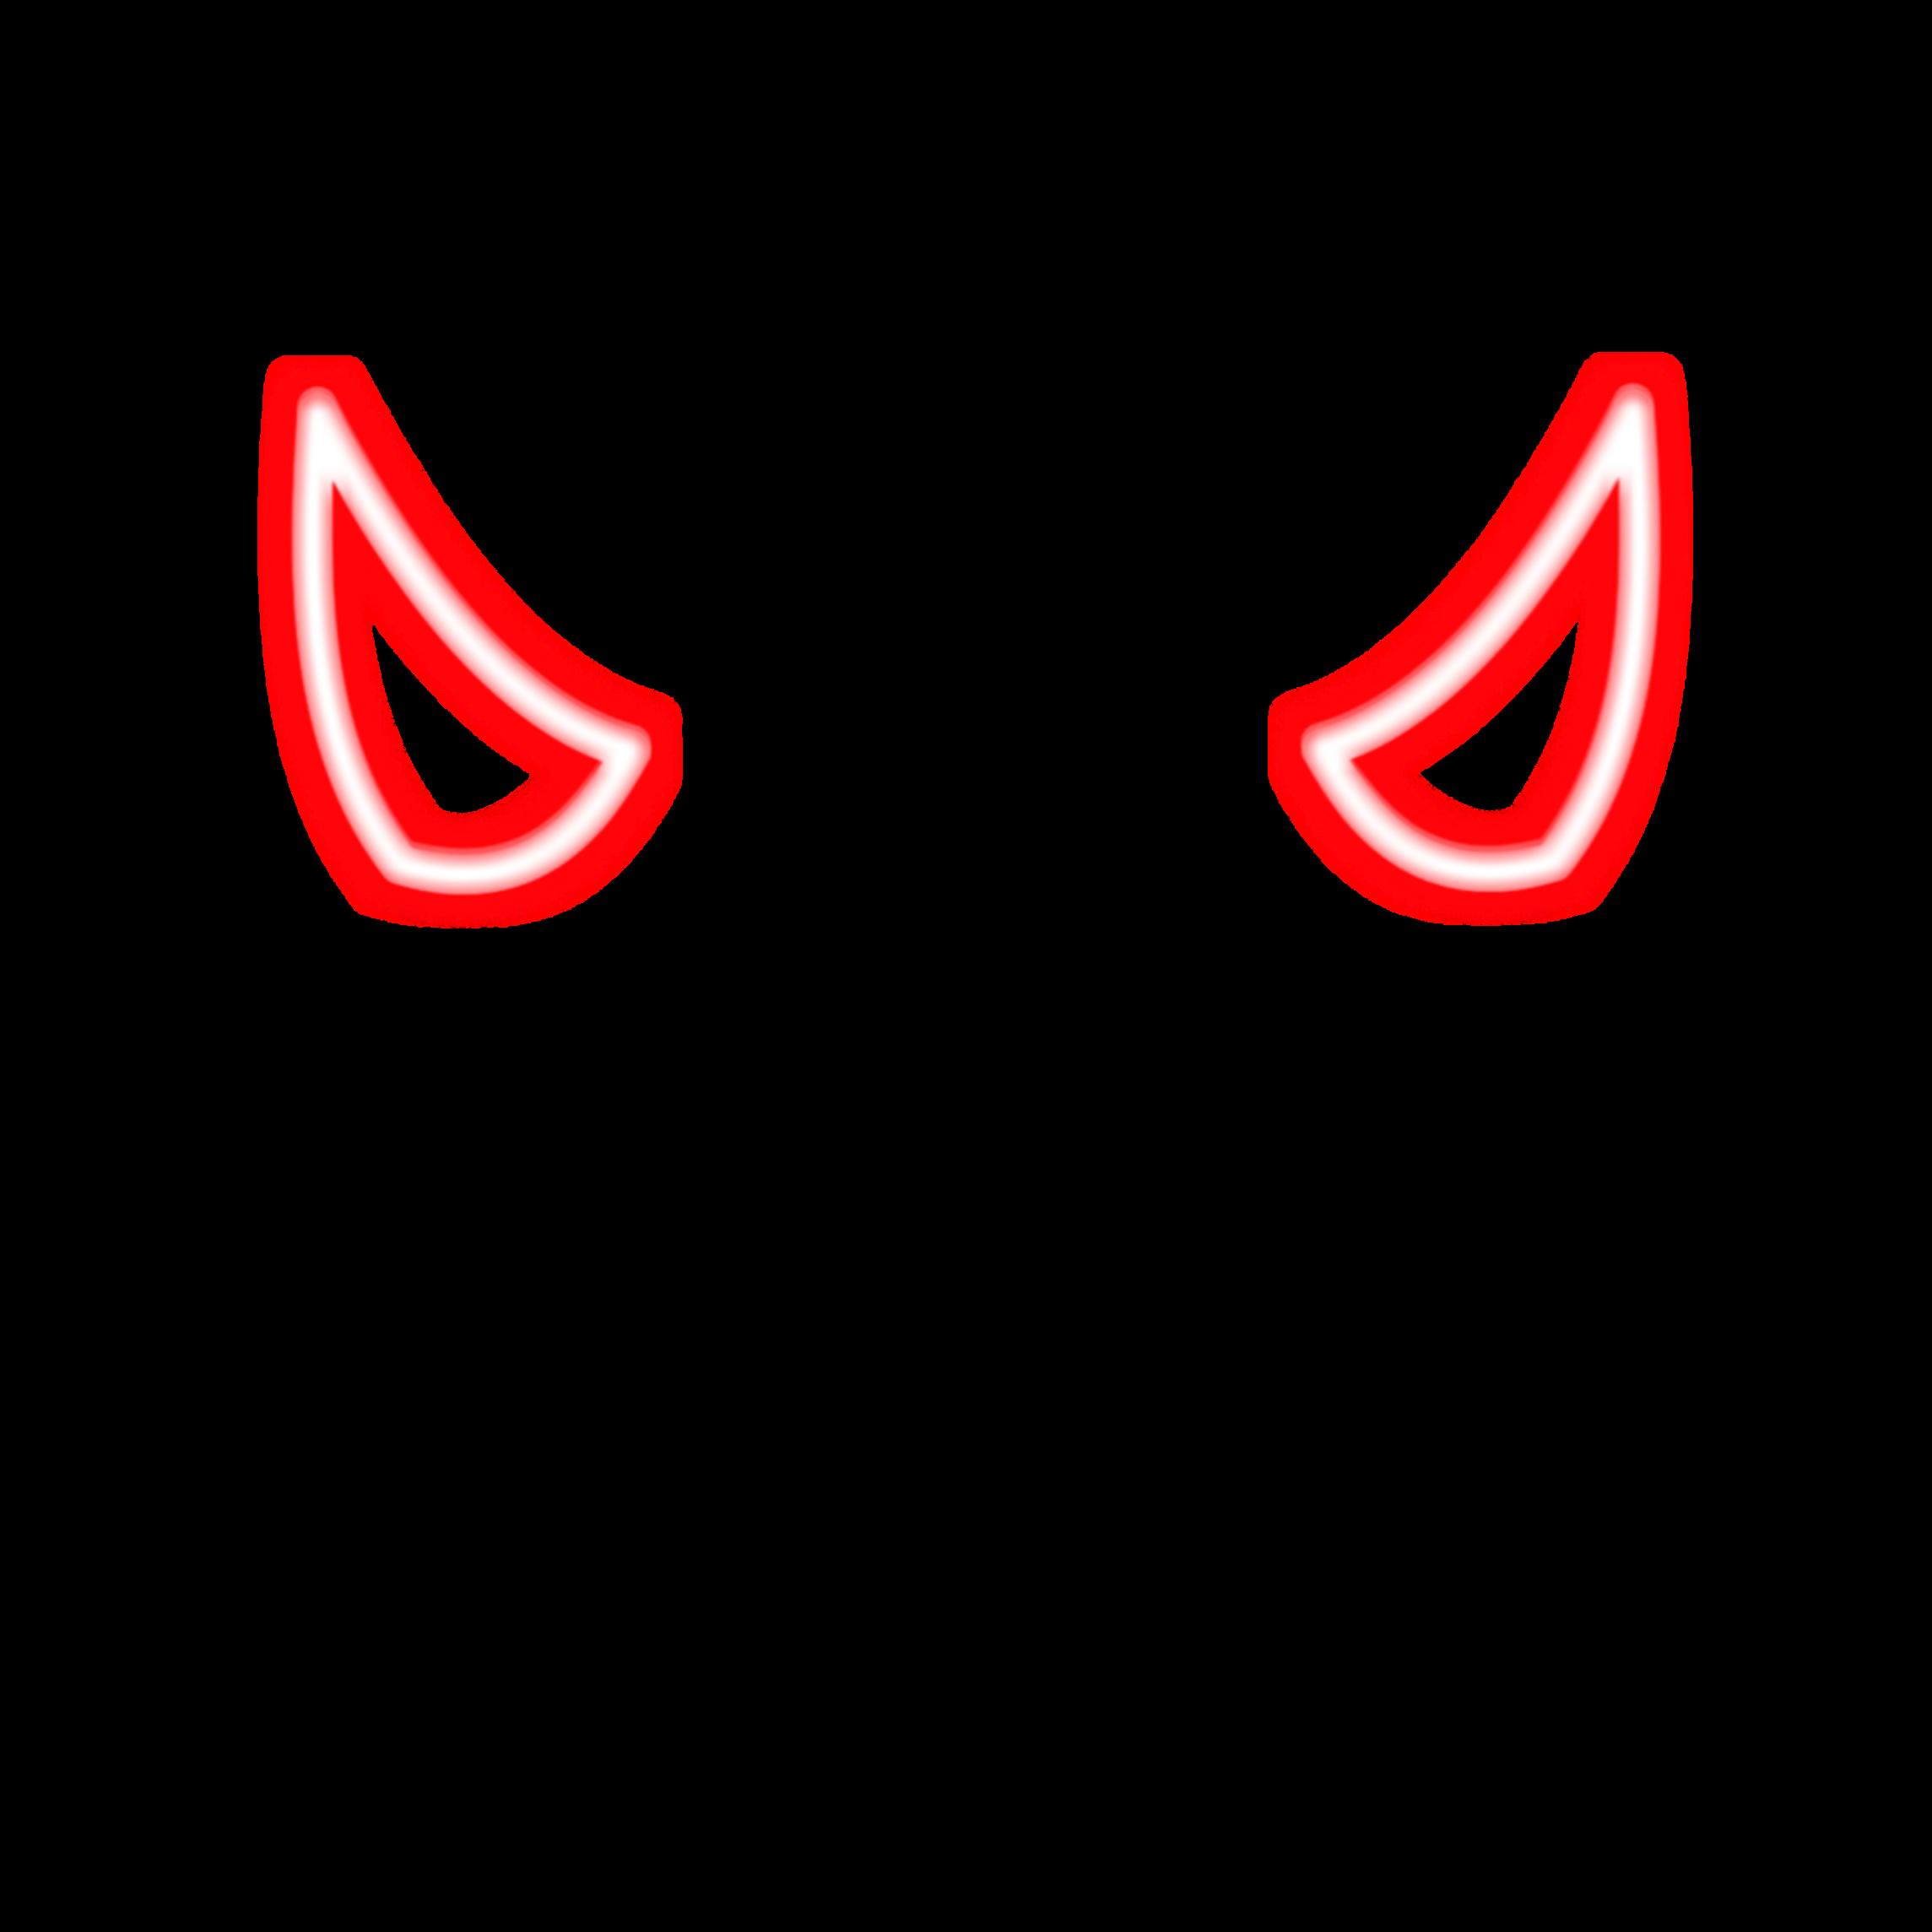 freetoedit devil devilhorns horns tail demon head overl...